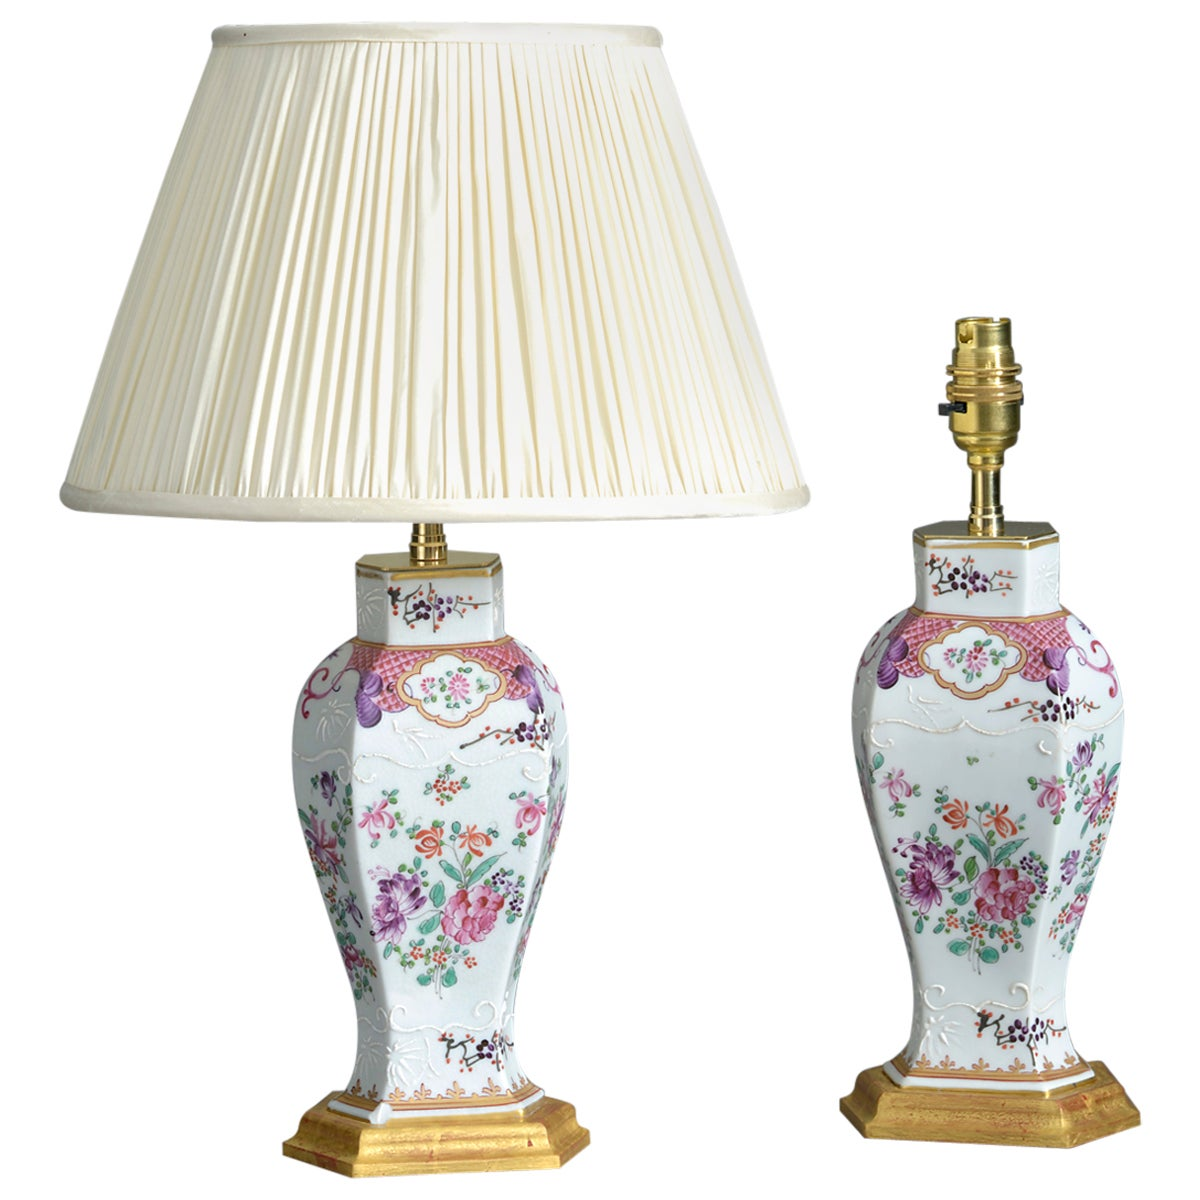 Pair of 19th Century Samson Famille Rose Porcelain Vase Lamps